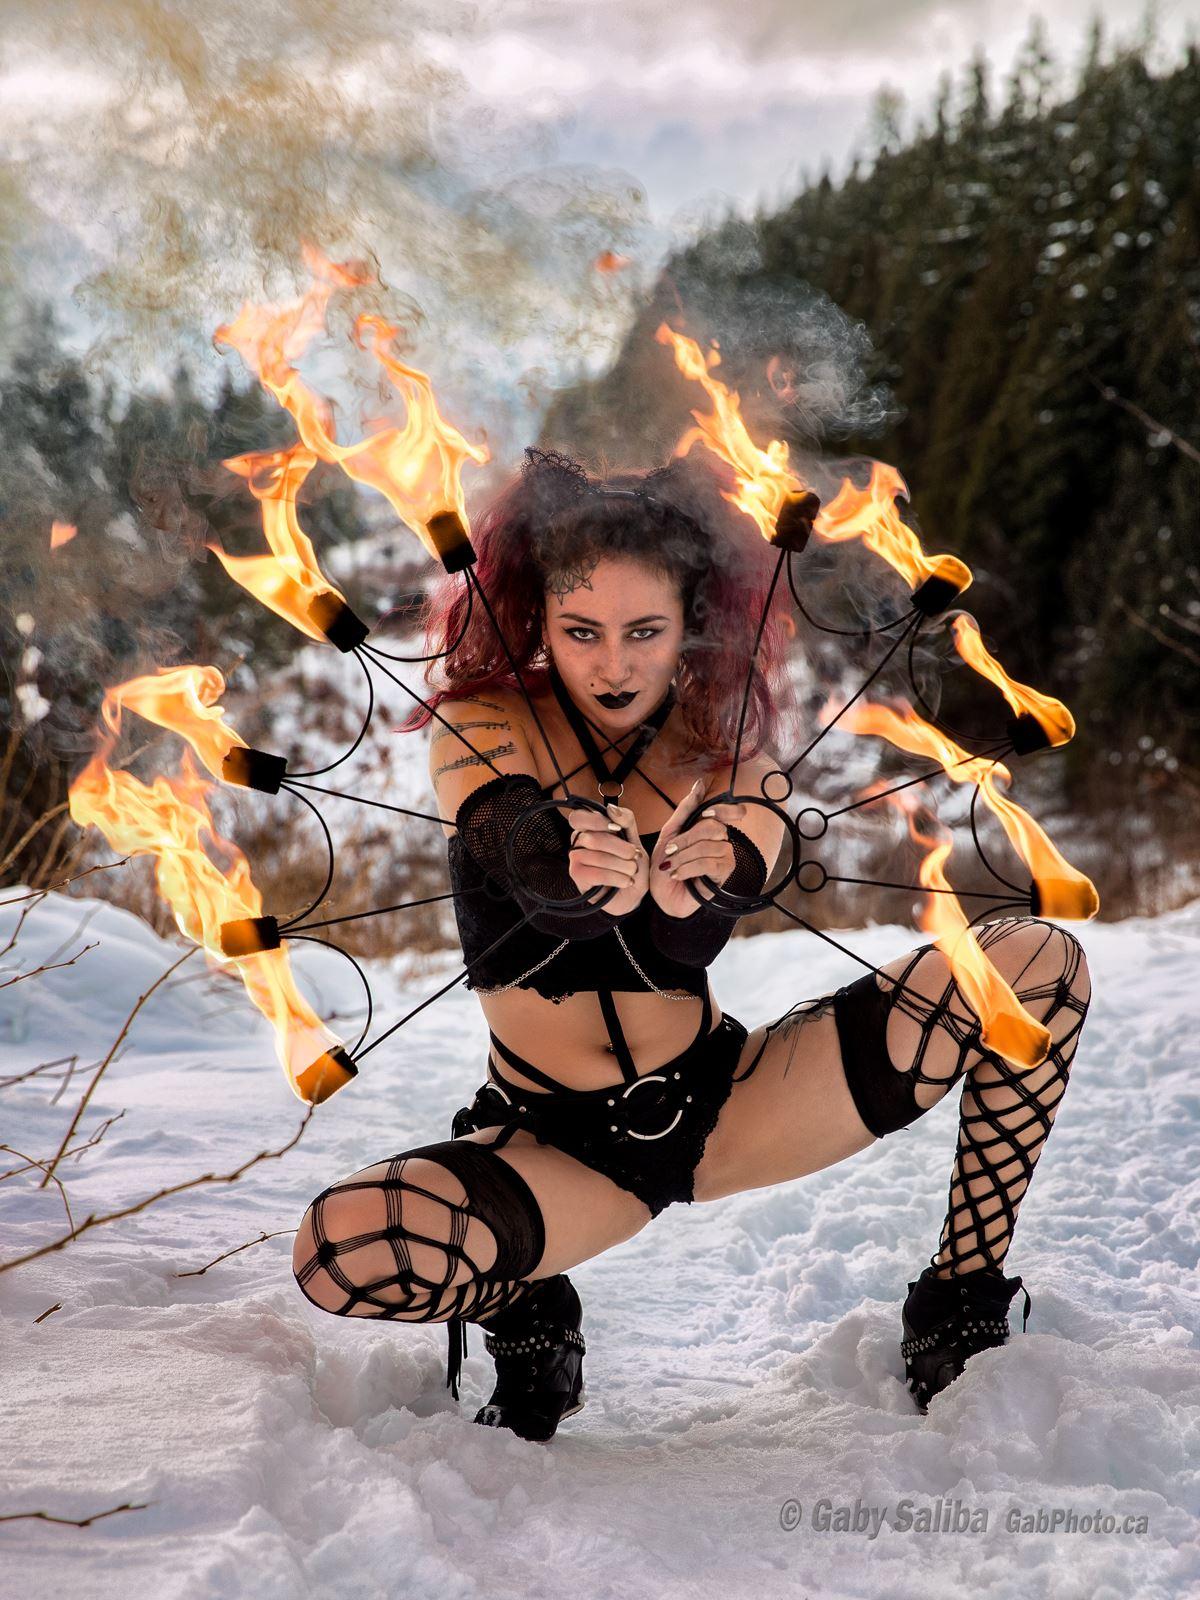 Vancouver Fire Dancer Kosmic Kitty Flamewater Circus (2)